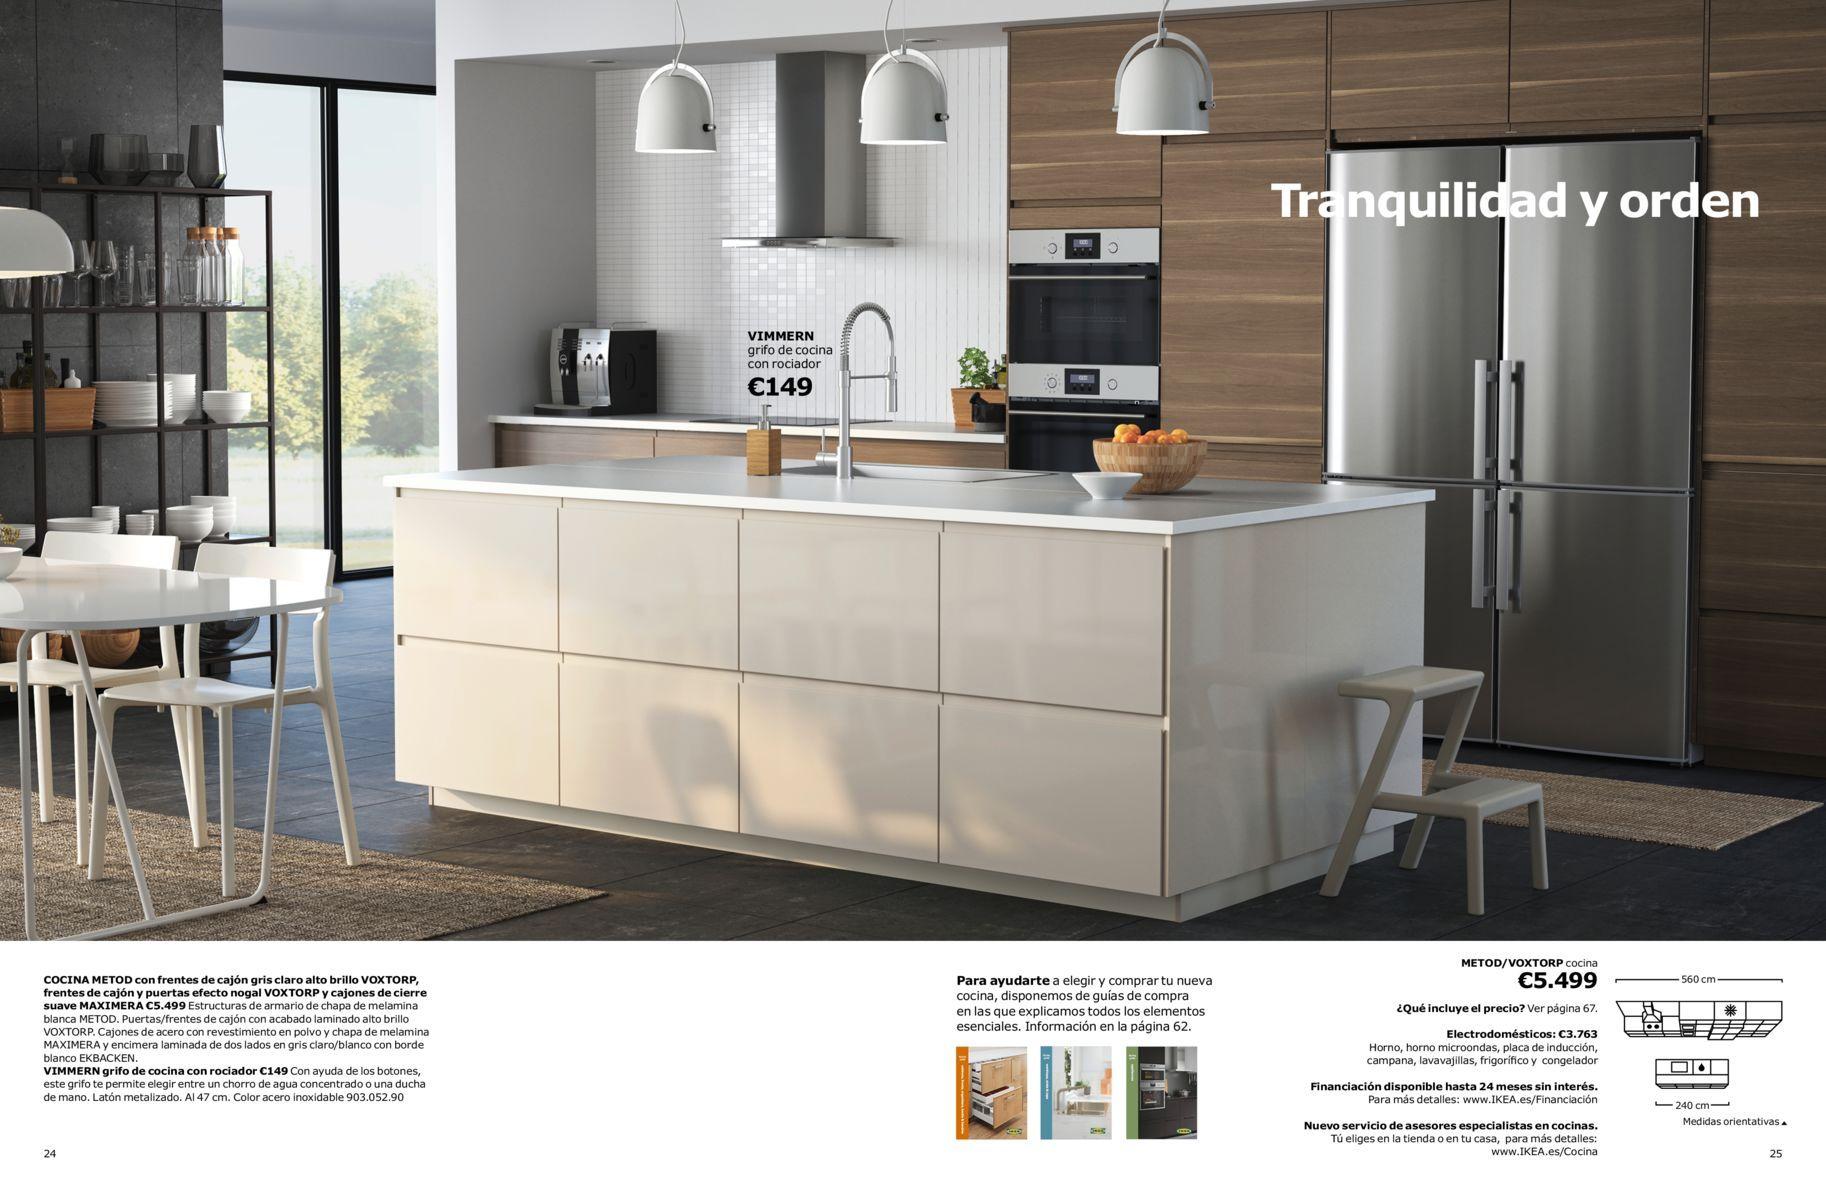 Catalogo De Cocinas 2020 Muebles De Cocina Ikea Cocina Ikea Catalogo Cocinas